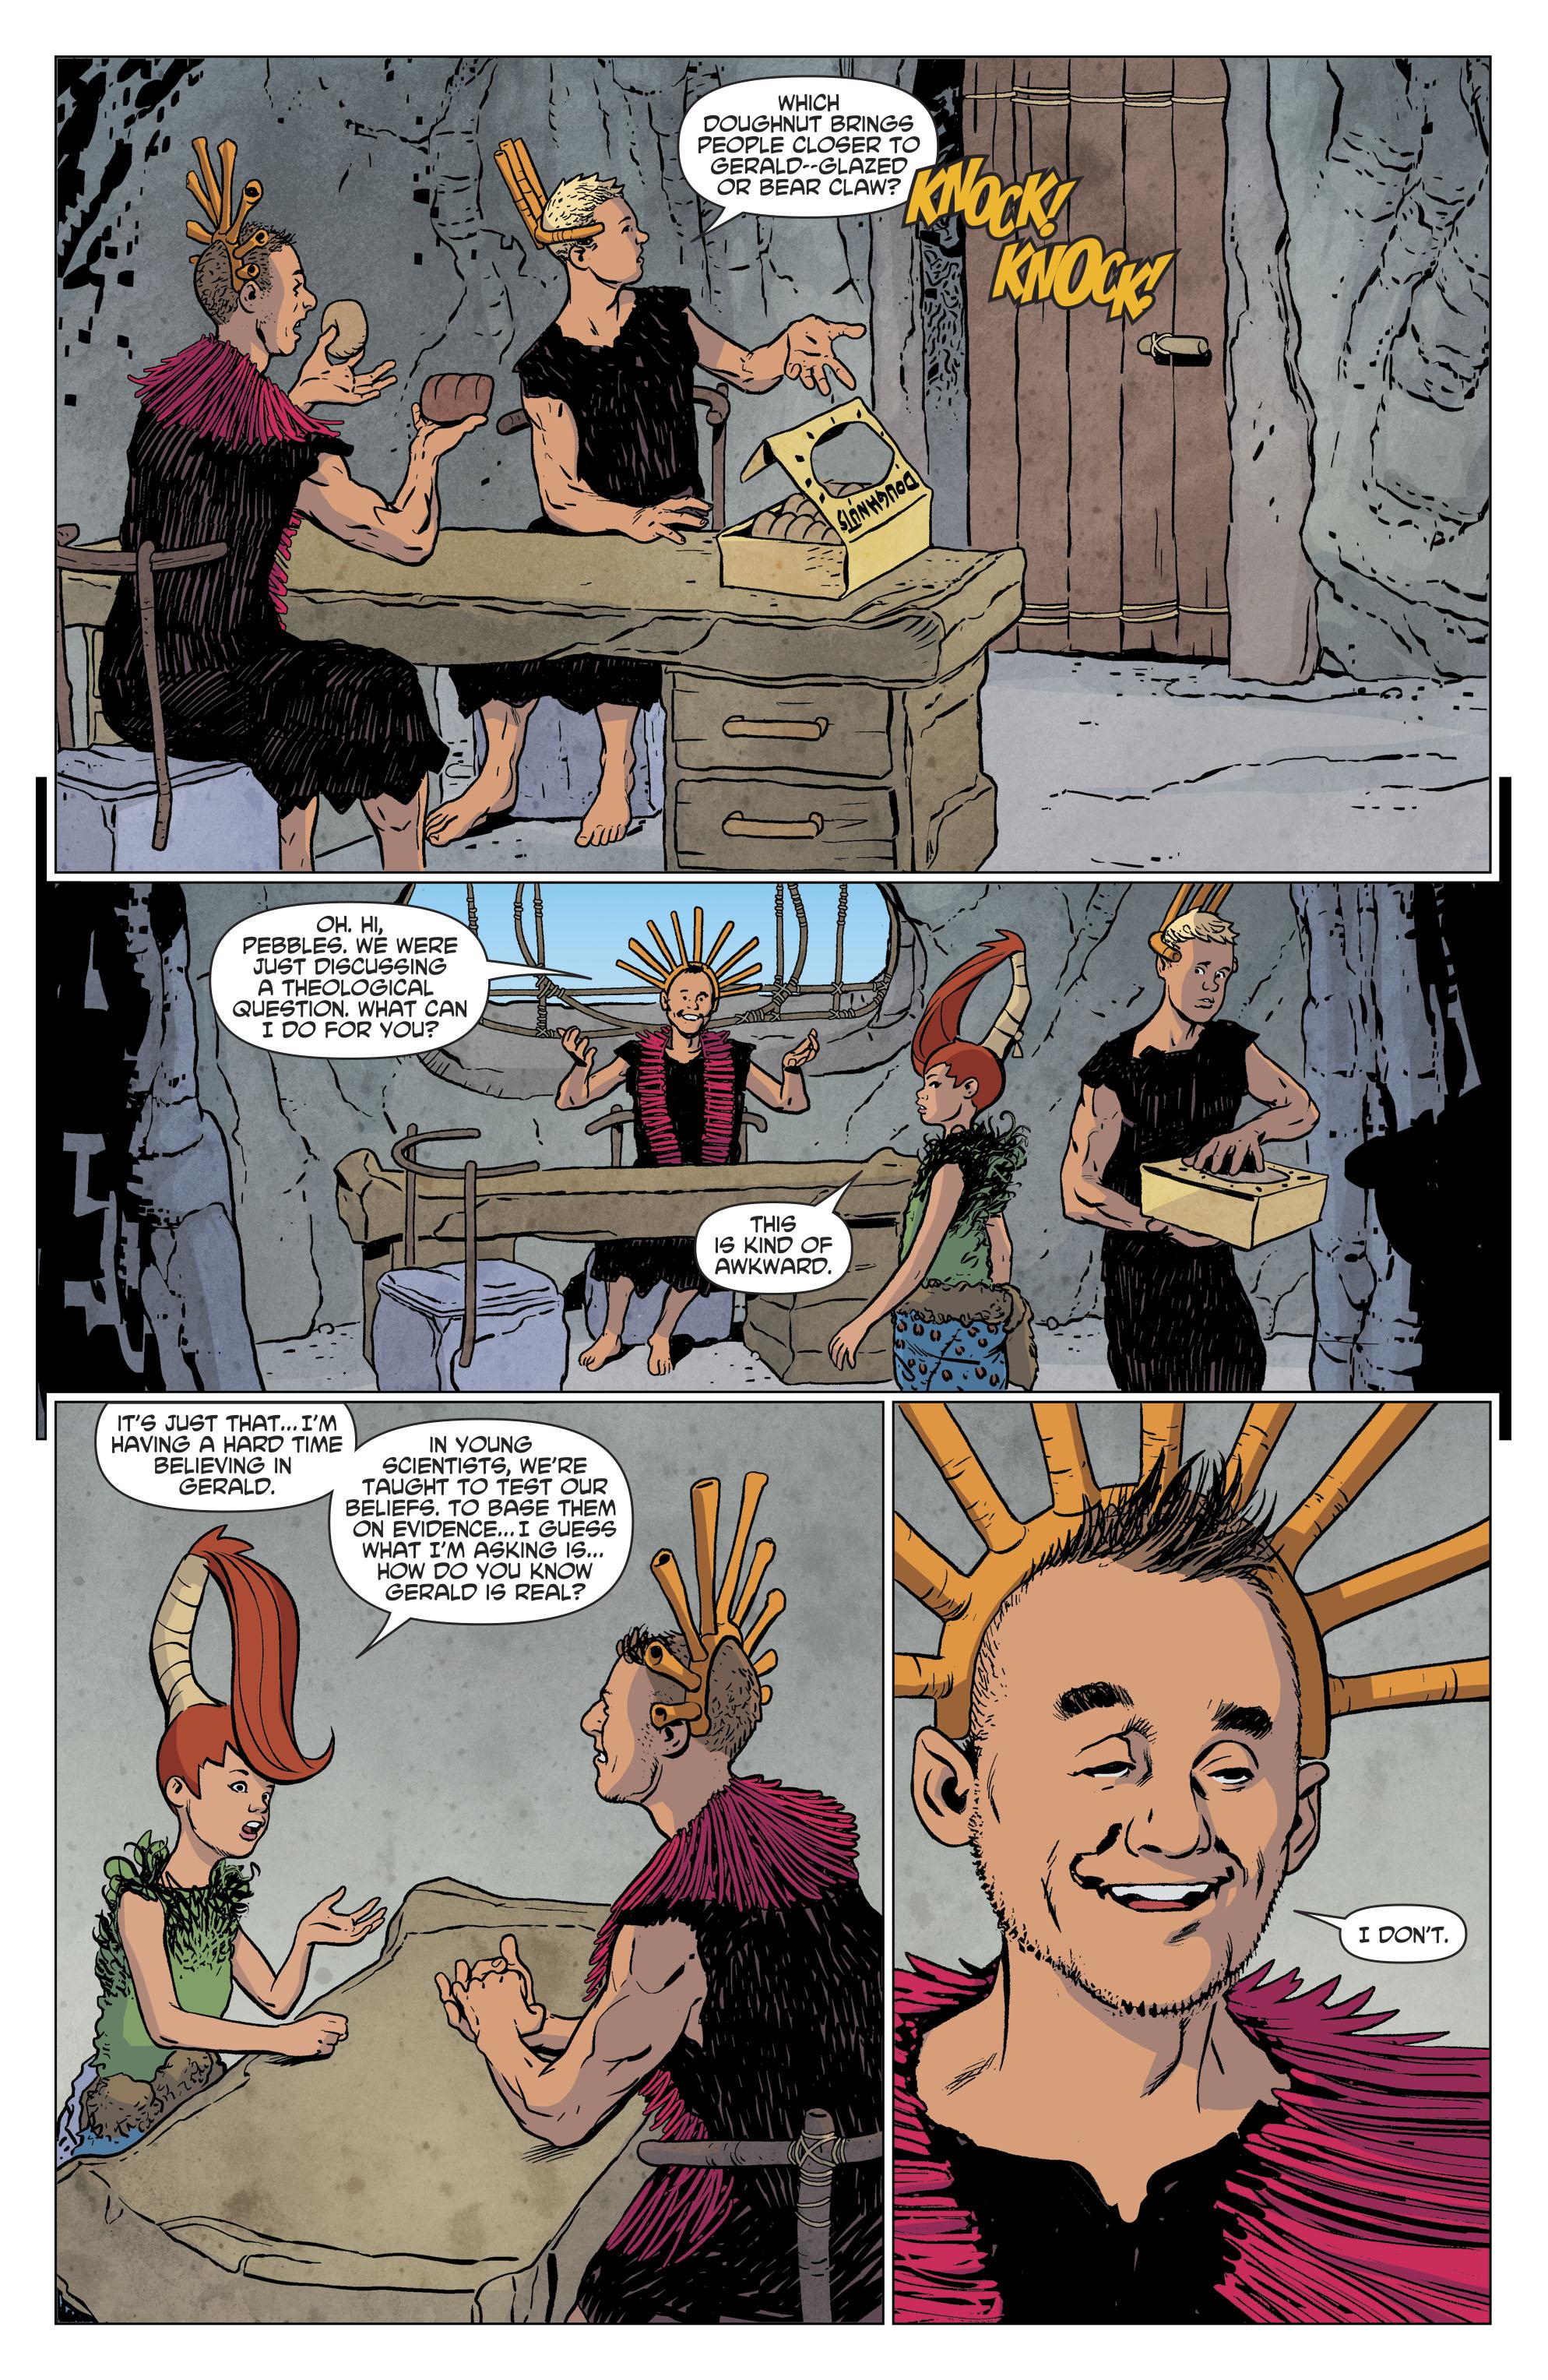 Read online The Flintstones comic -  Issue #12 - 20